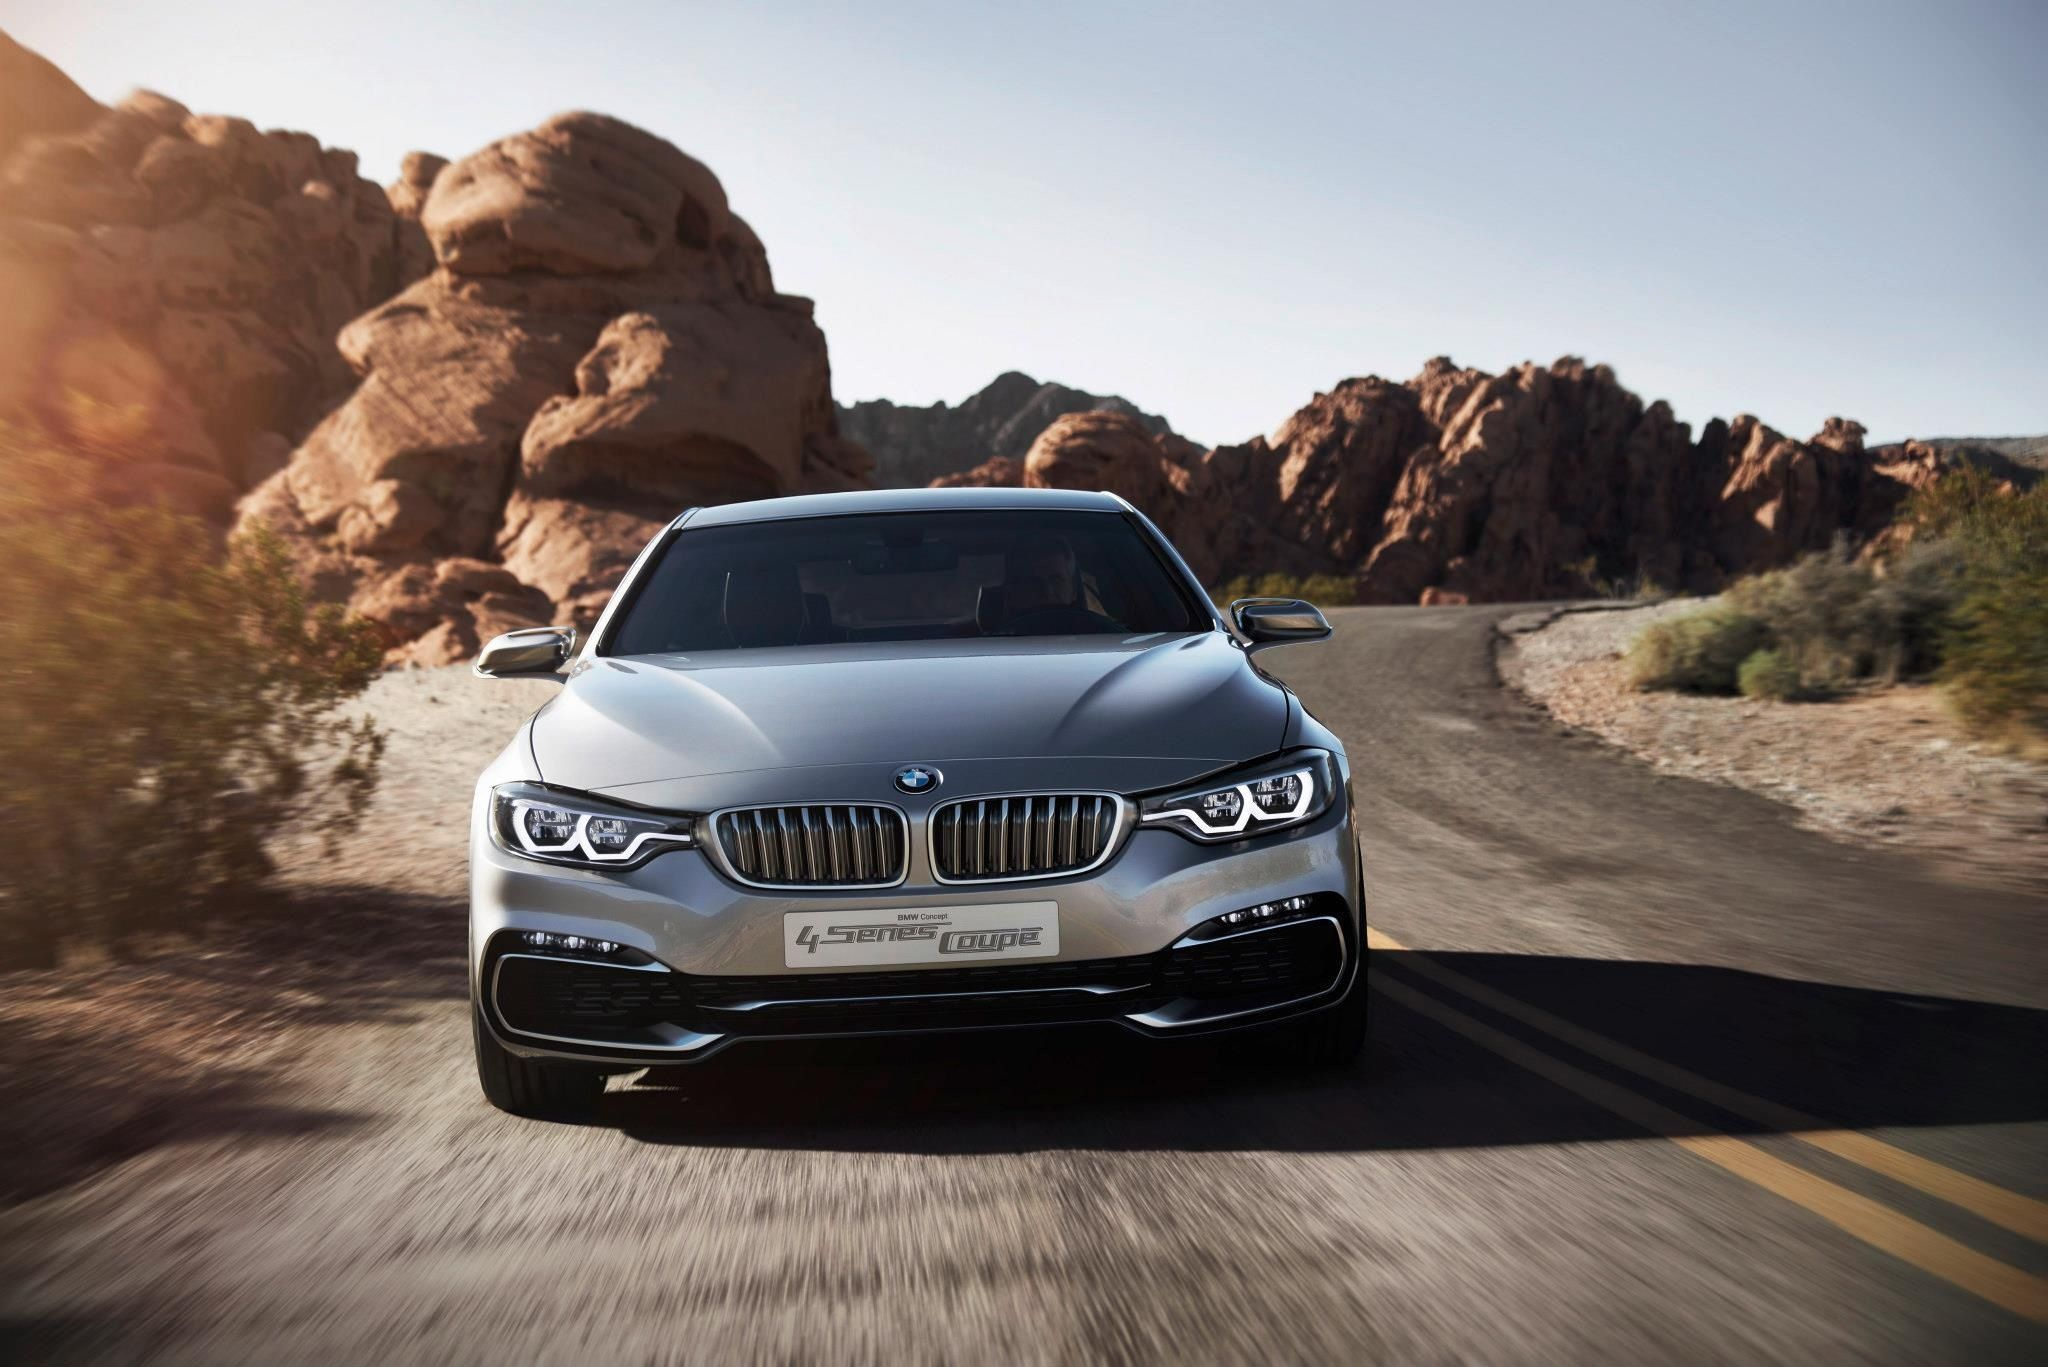 BMW 4 series (с изображениями)   Автомобили, Галерея